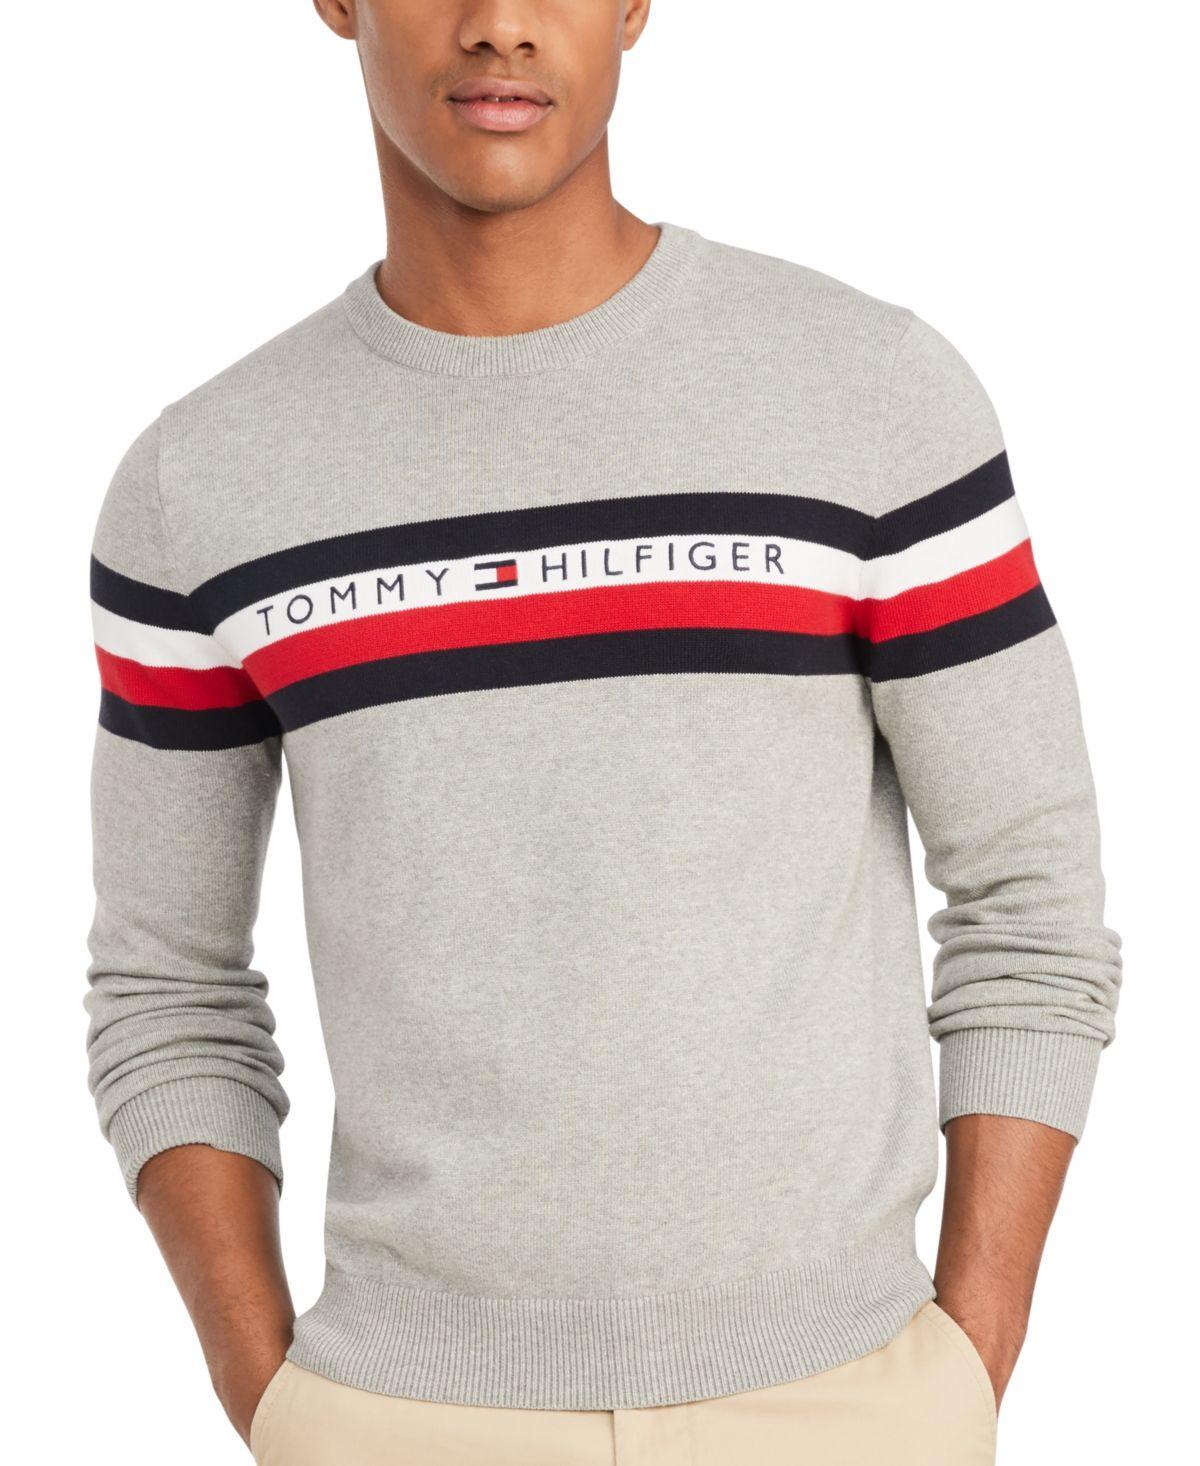 Tommy Hilfiger Men S Casper Regular Fit Stripe Embroidered Logo Sweater Sport Grey Heather Tommy Hilfiger Man Tommy Hilfiger Tommy [ 1466 x 1200 Pixel ]